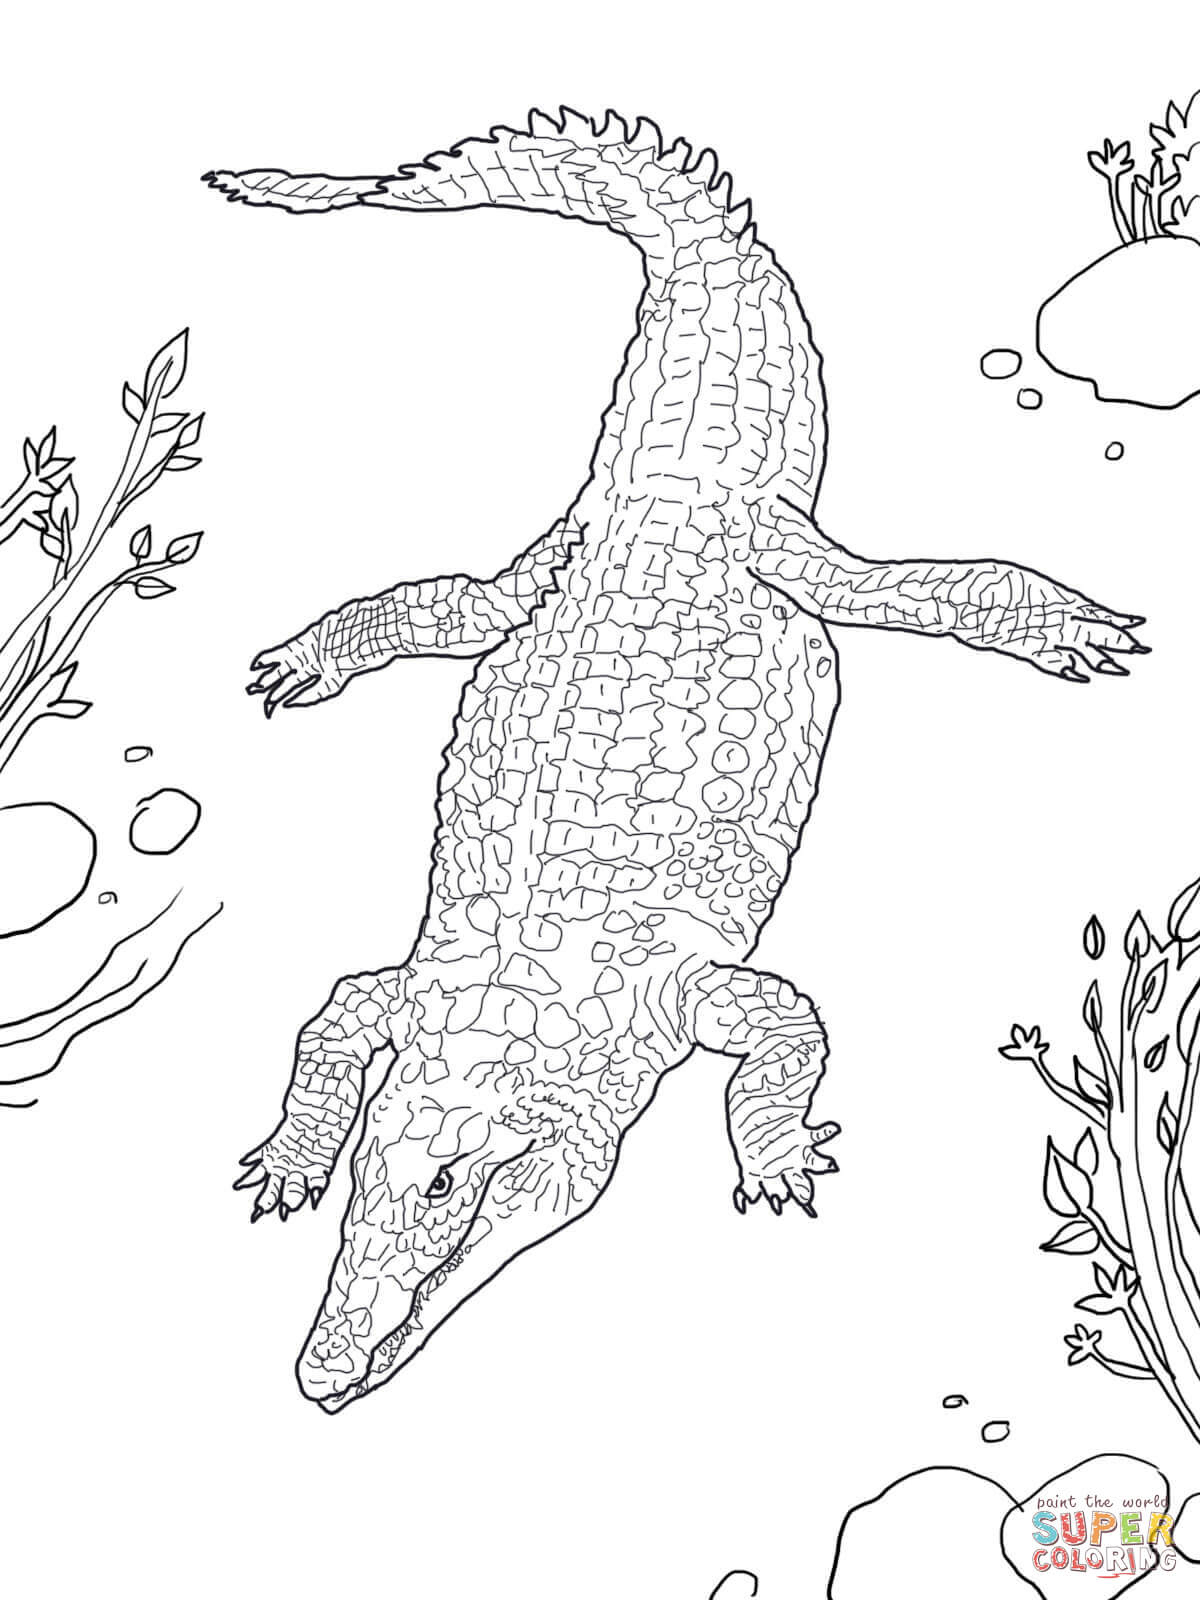 Nile Crocodile Coloring Page | Free Printable Coloring Pages - Free Printable Pictures Of Crocodiles